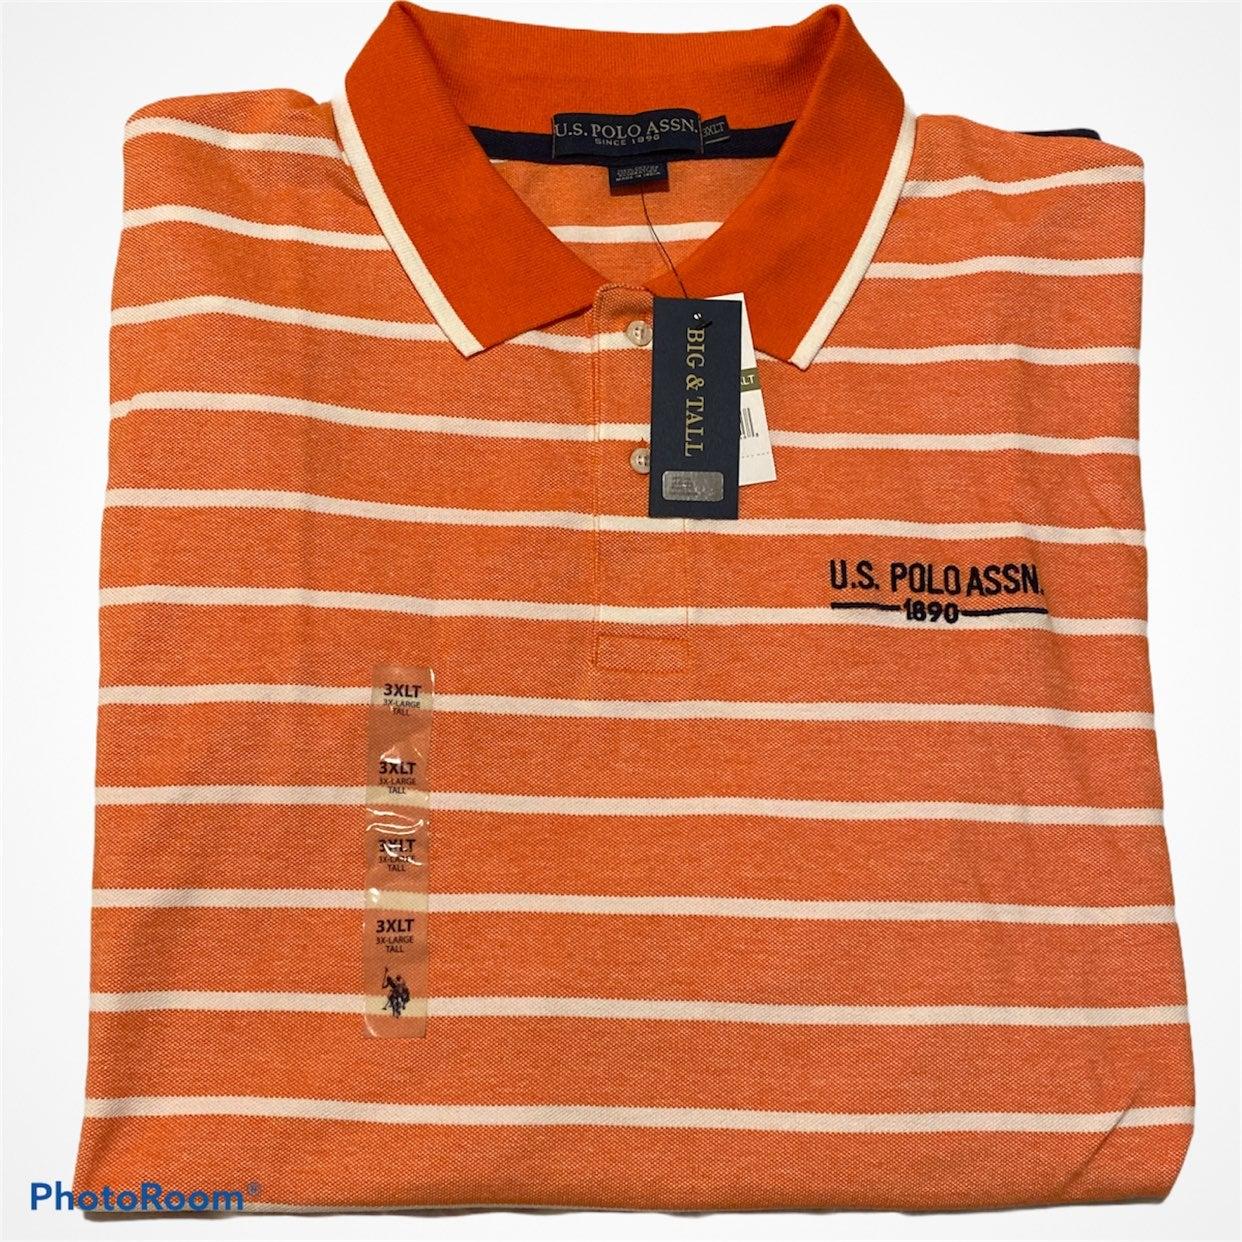 U.S. Polo Assn Orange Striped Polo 3XLT